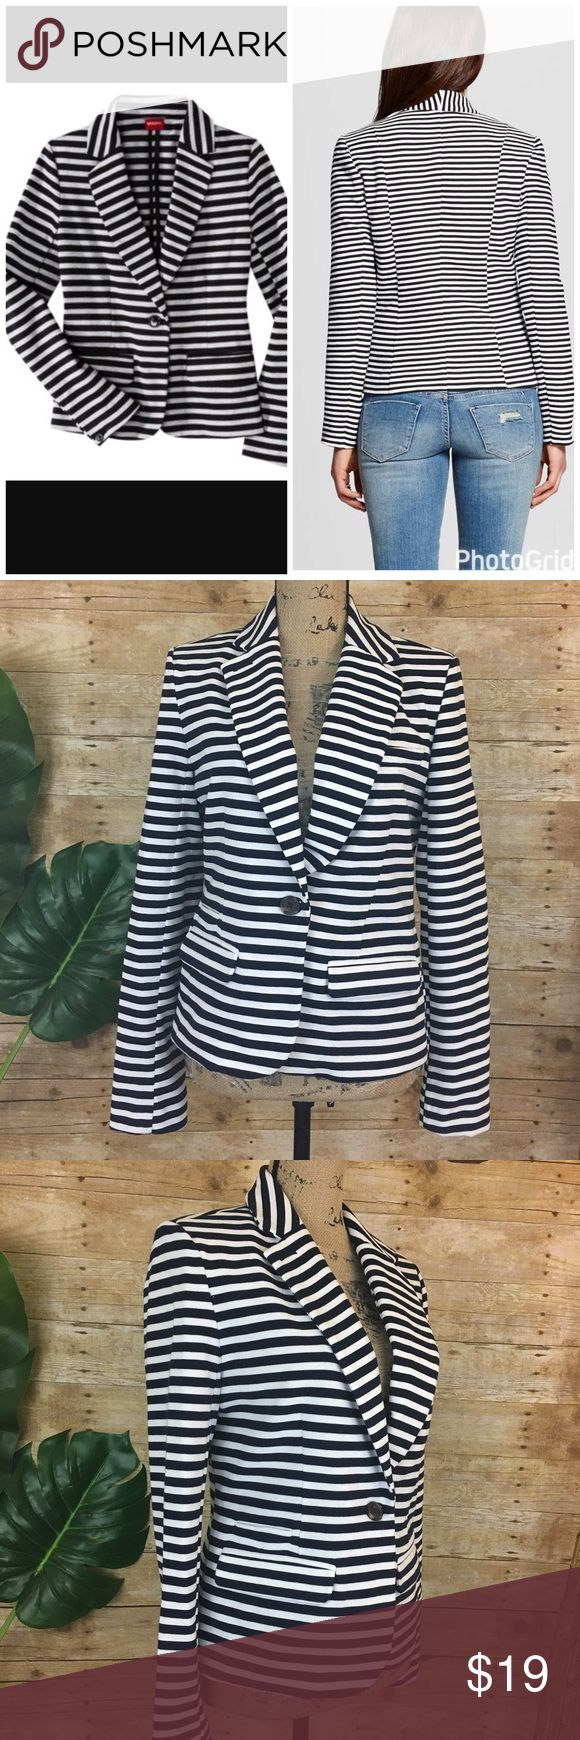 "Merona Blue and White Striped Jacket Merona Blue and White Striped Jacket     Chest: 19""  (armpit to armpit - flat lay) Length: 22.5""  (shoulder to hem) Sleeve Length: 24.5"" Merona Jackets & Coats"